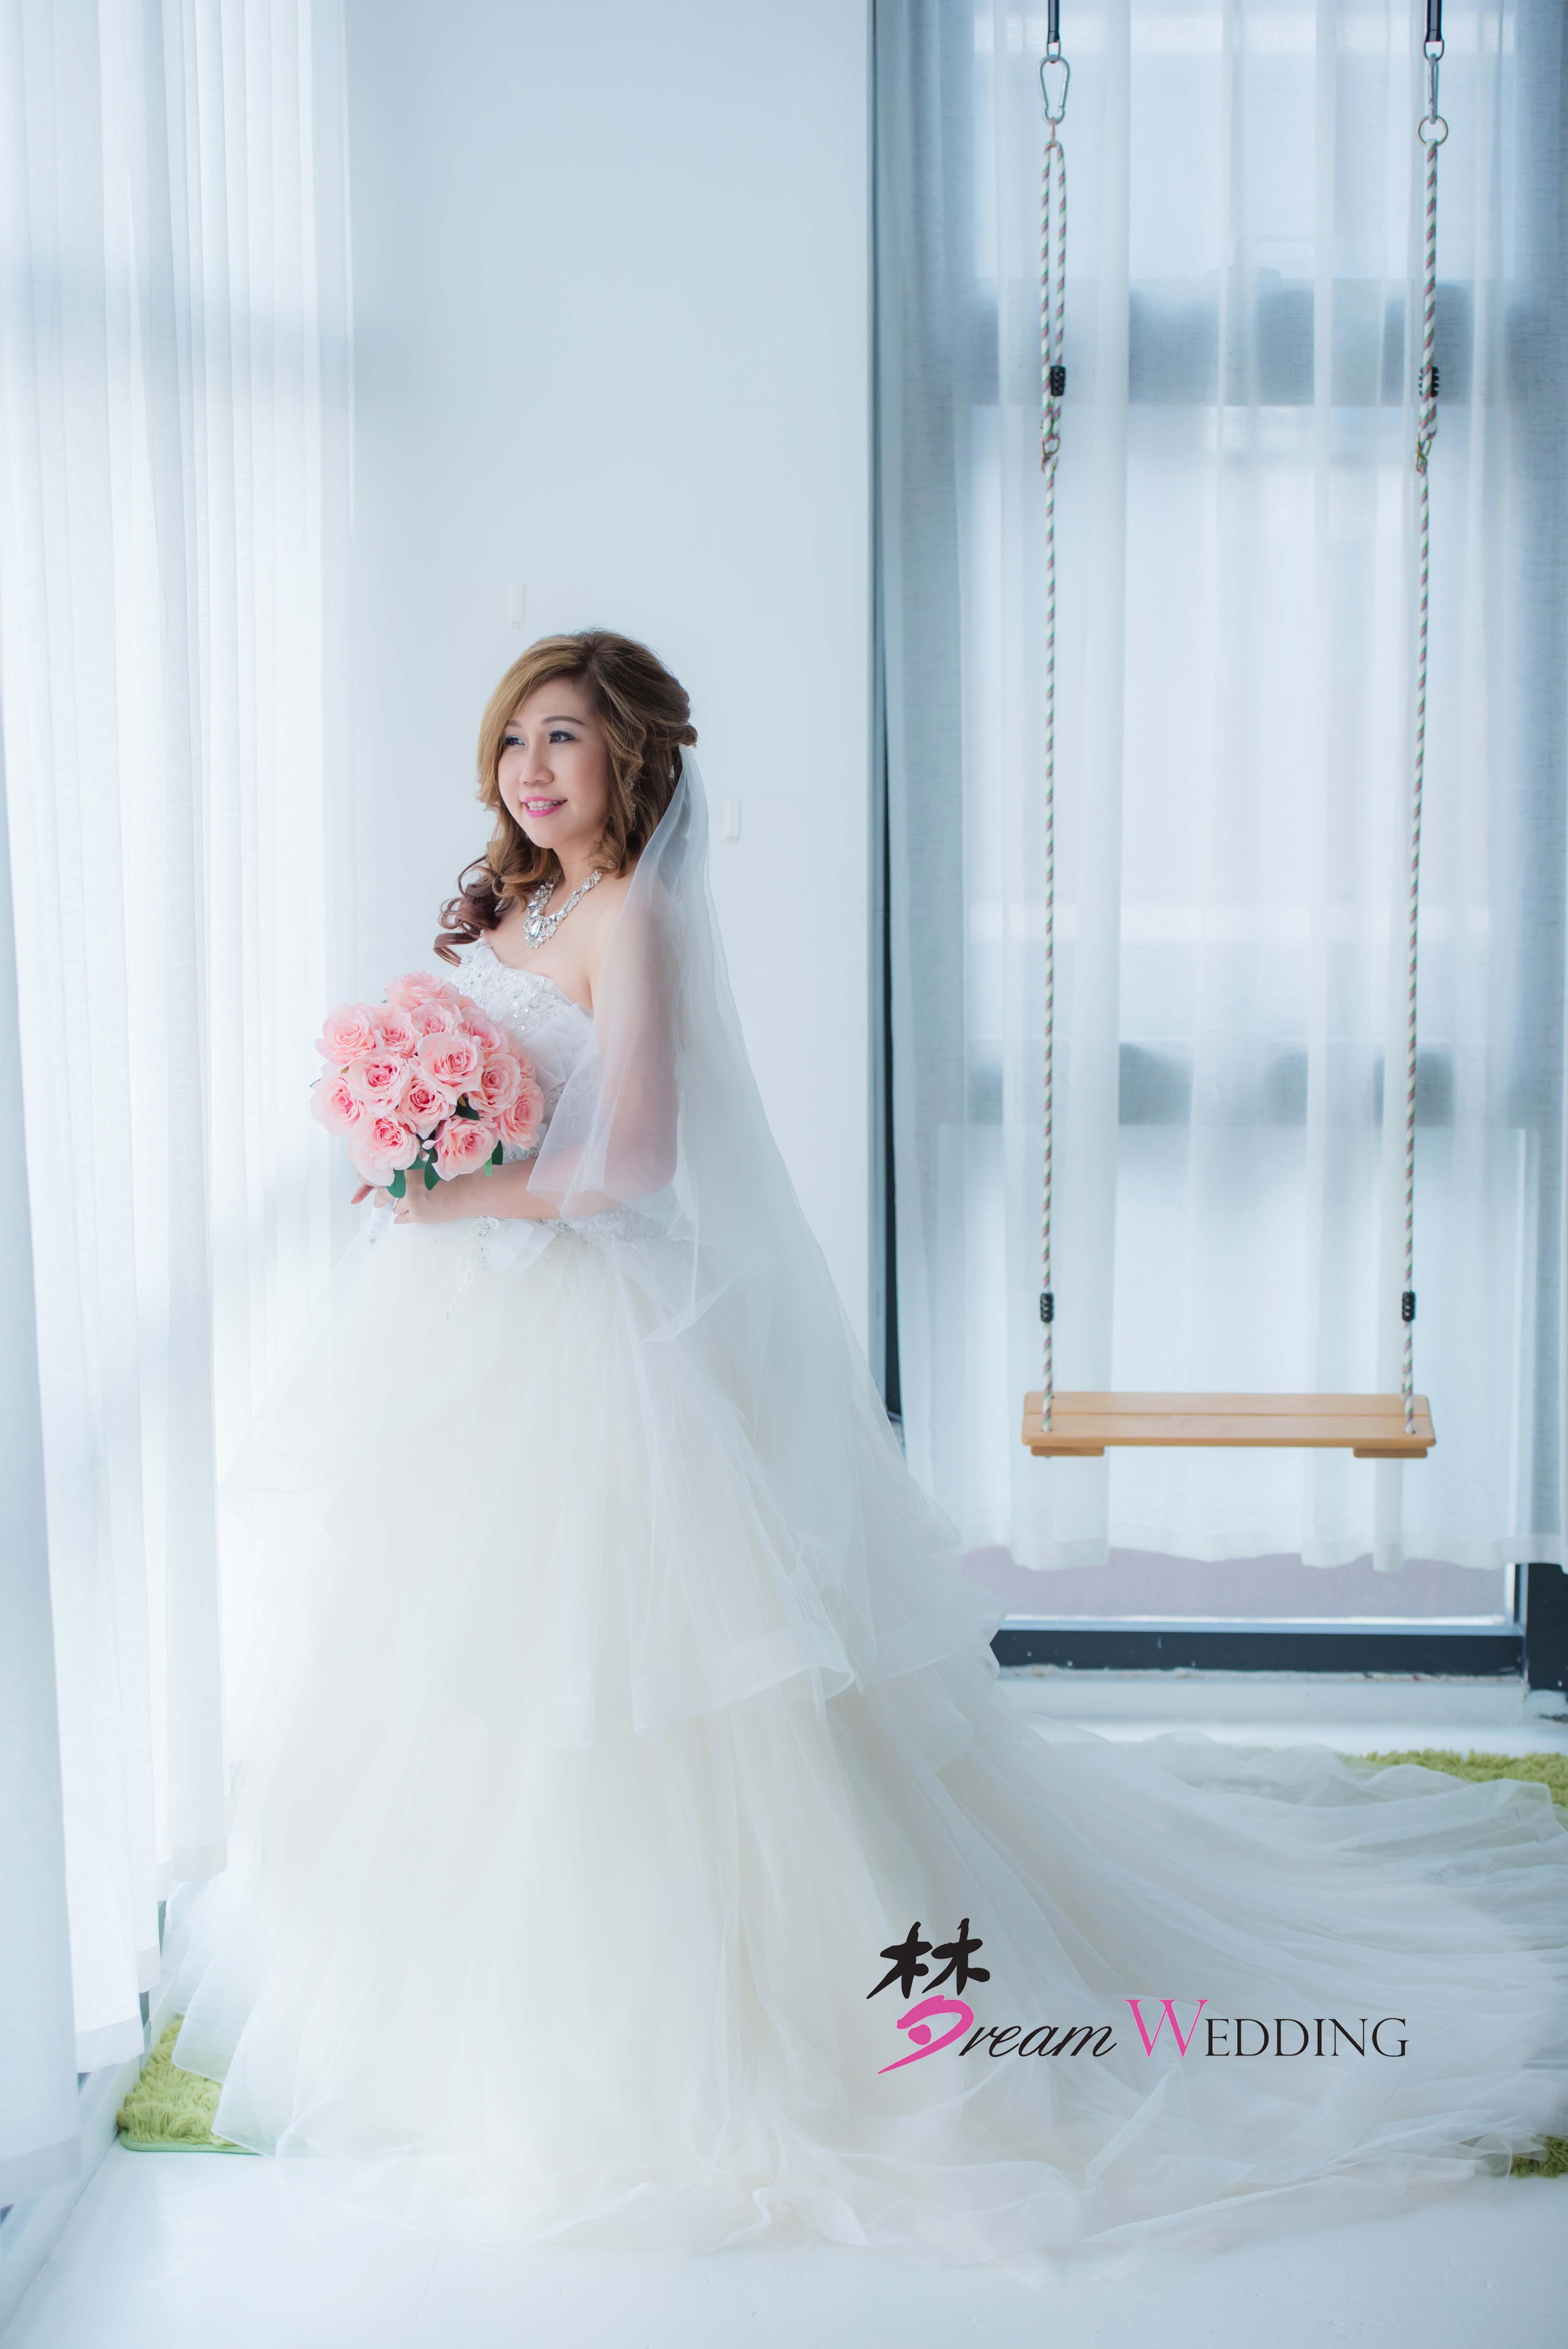 Samuel & Feon Singapore Indoor Pre Wedding Photography - Bridal, Photography, Gown Rental